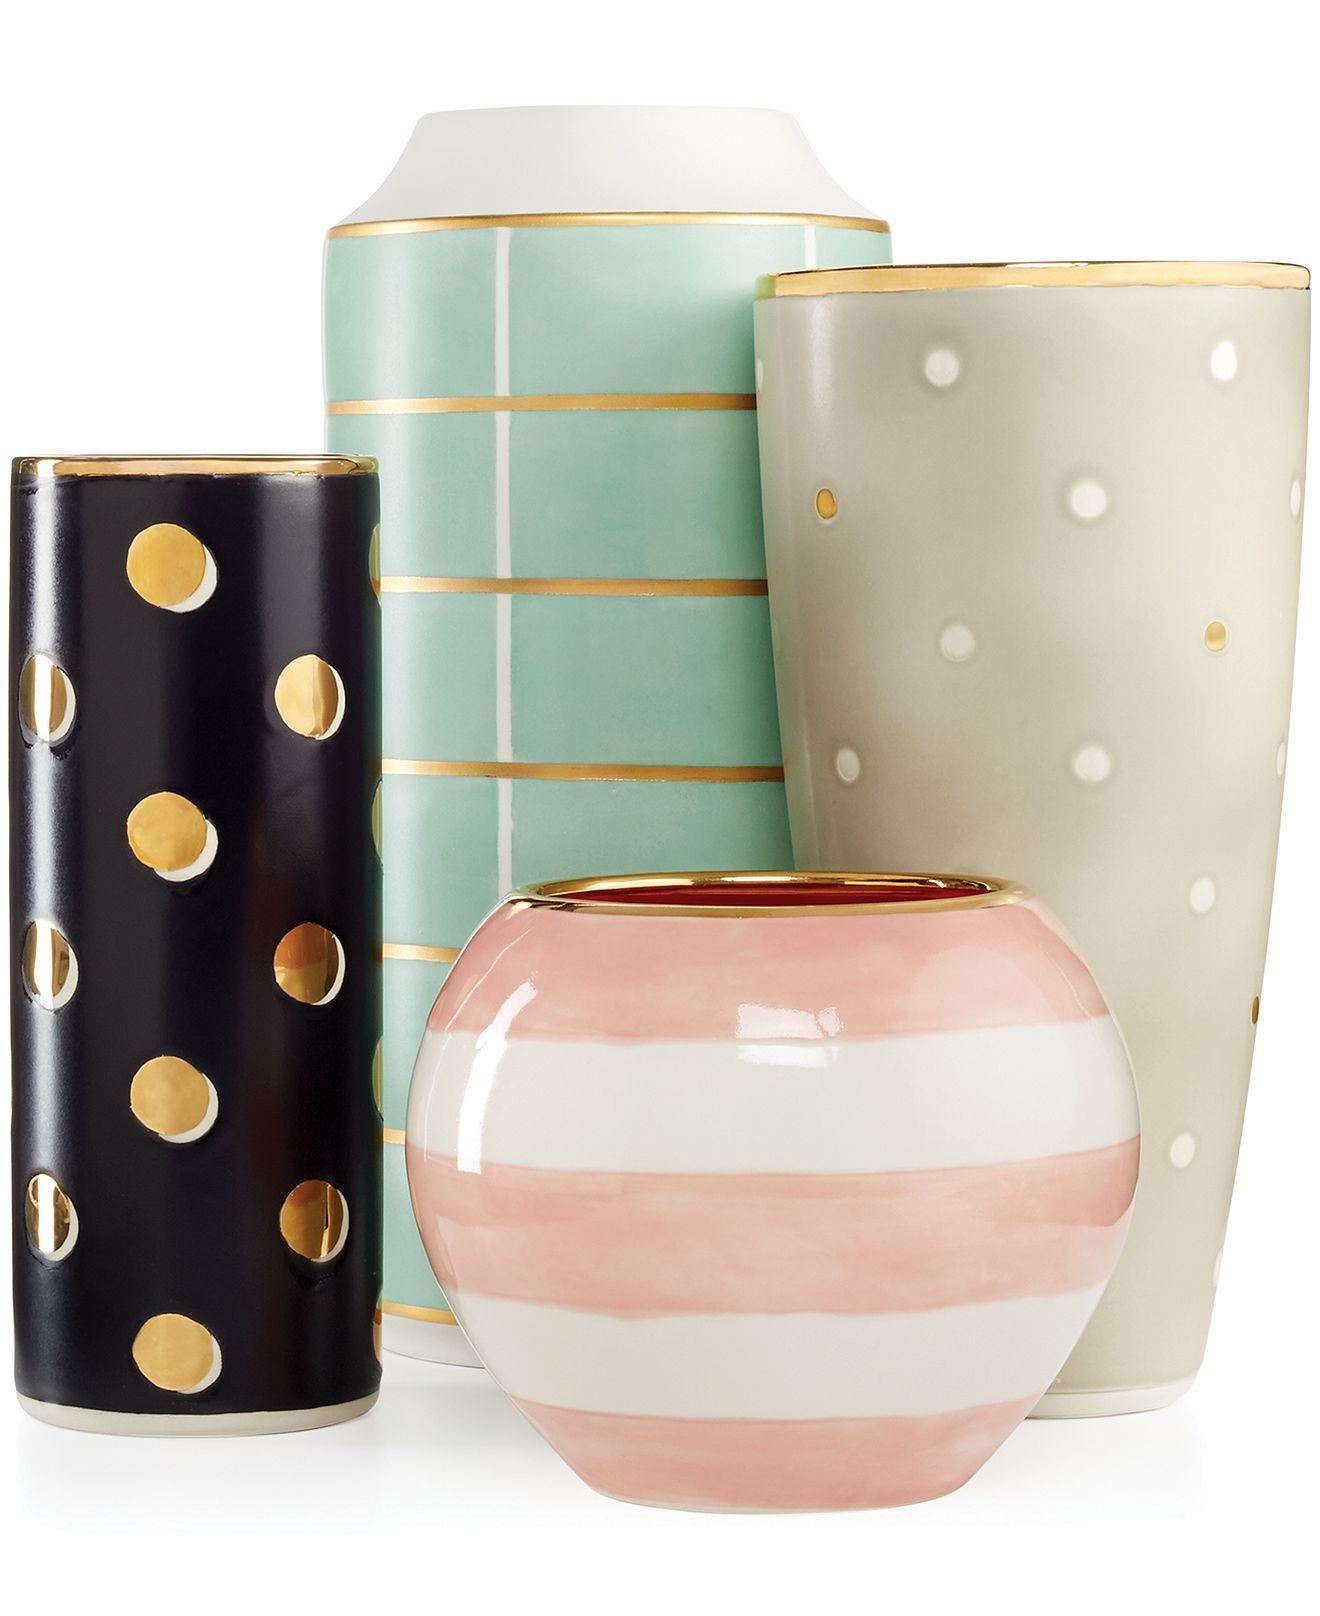 Kate spade new york sunset street vase collection macys pink kate spade new york sunset street vase collection macys pink white one for the reviewsmspy